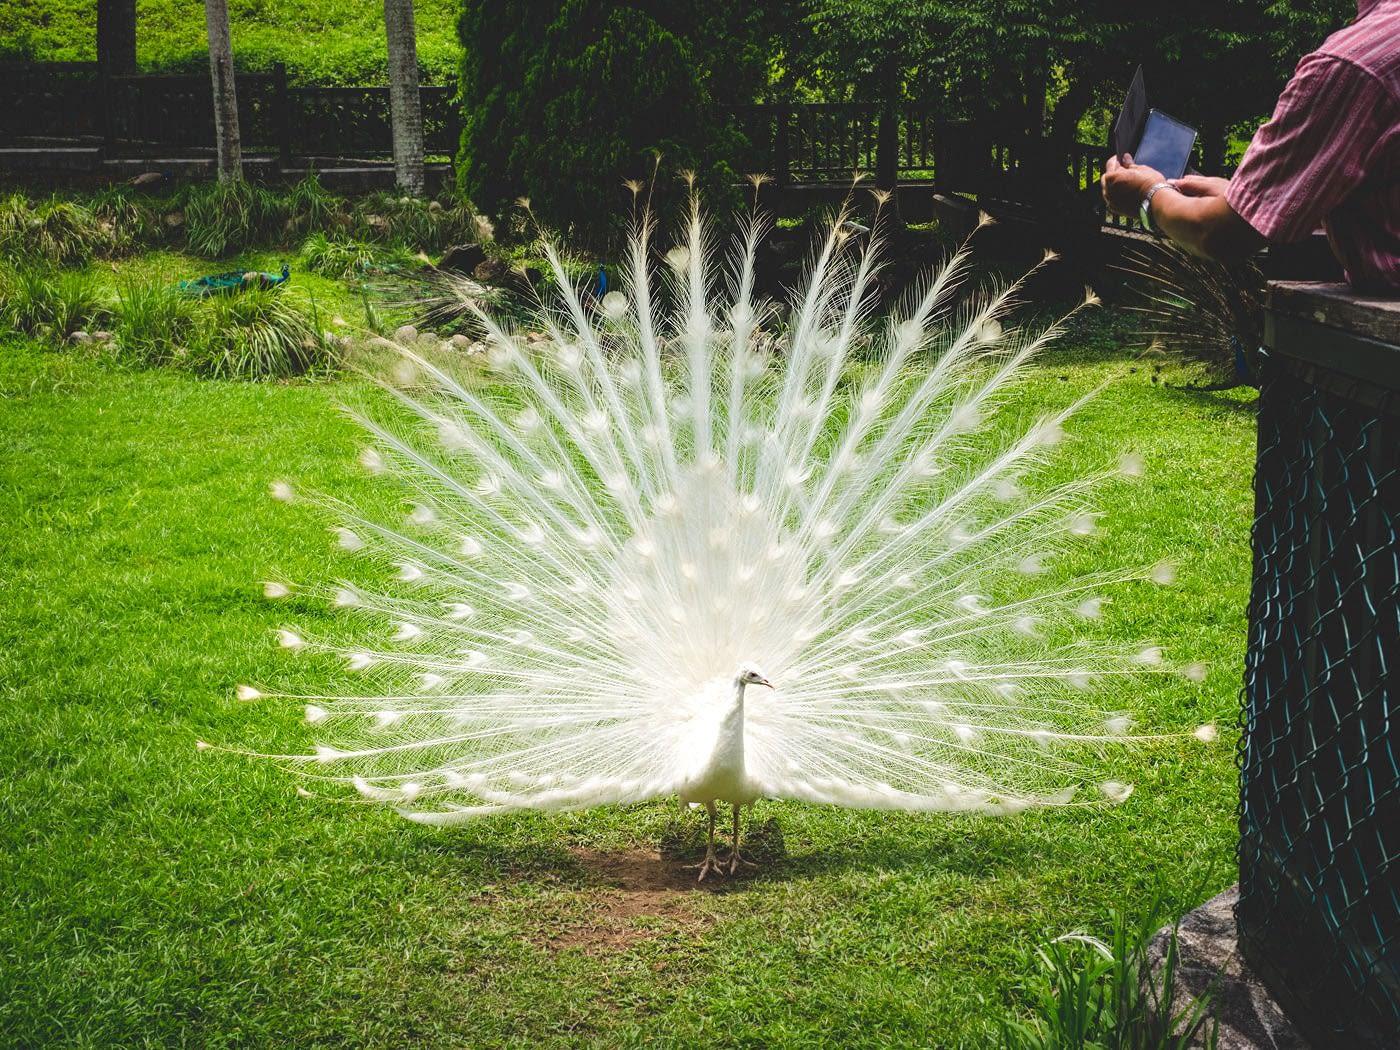 Taiwan - Peacock Garden - Beautiful white peacock